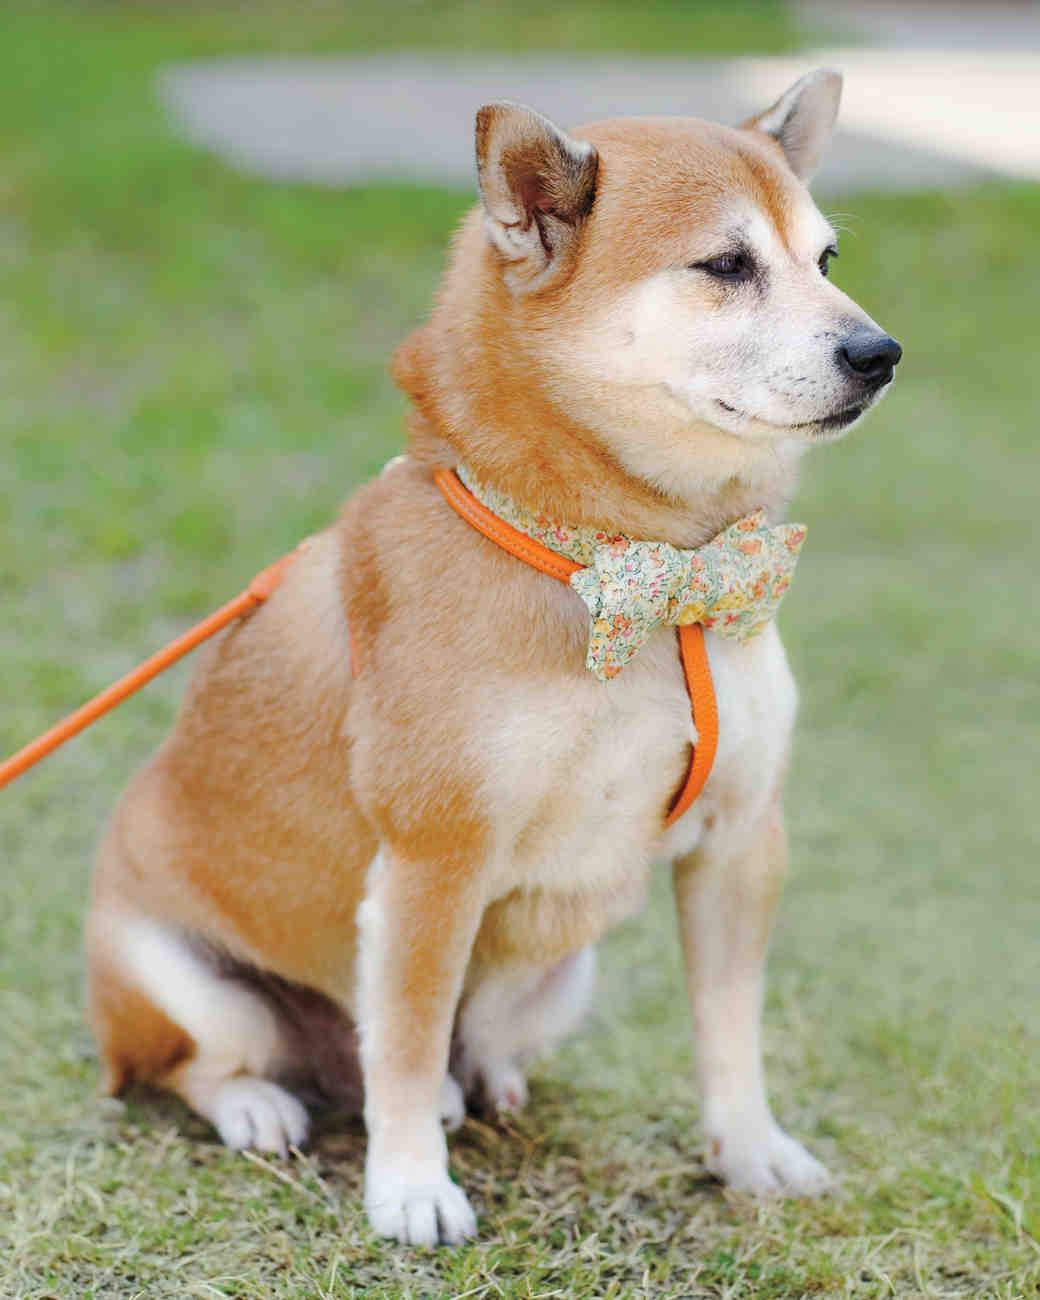 maggie-bryan-dog-atilla-0019-mwd108897.jpg